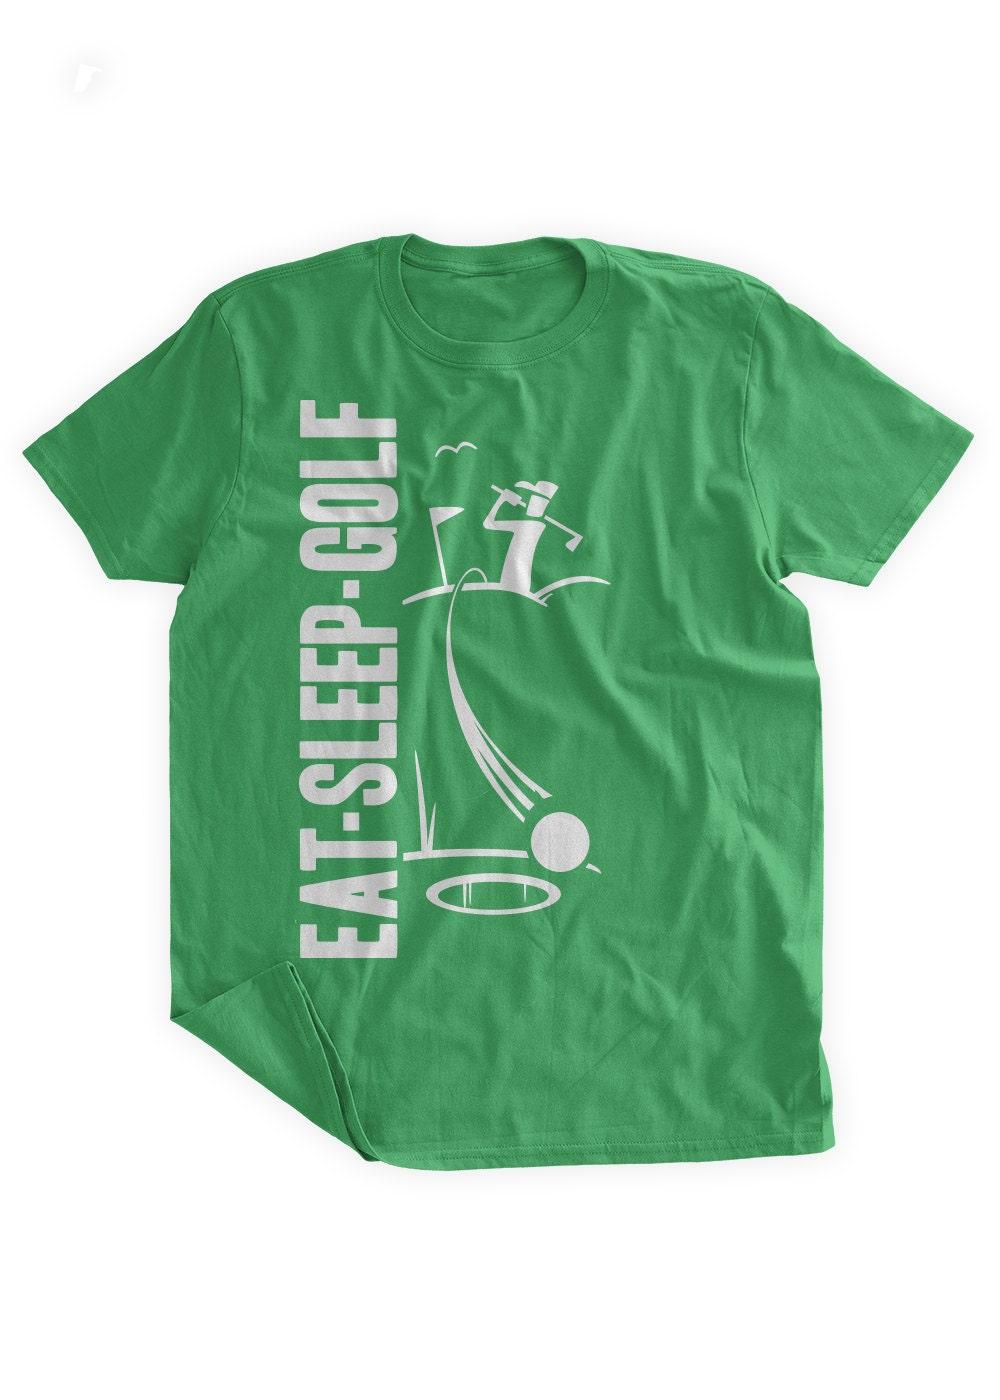 b3160c24 Eat Sleep Golf T-Shirt Golfing T-shirt Gifts for Golfers Tee | Etsy